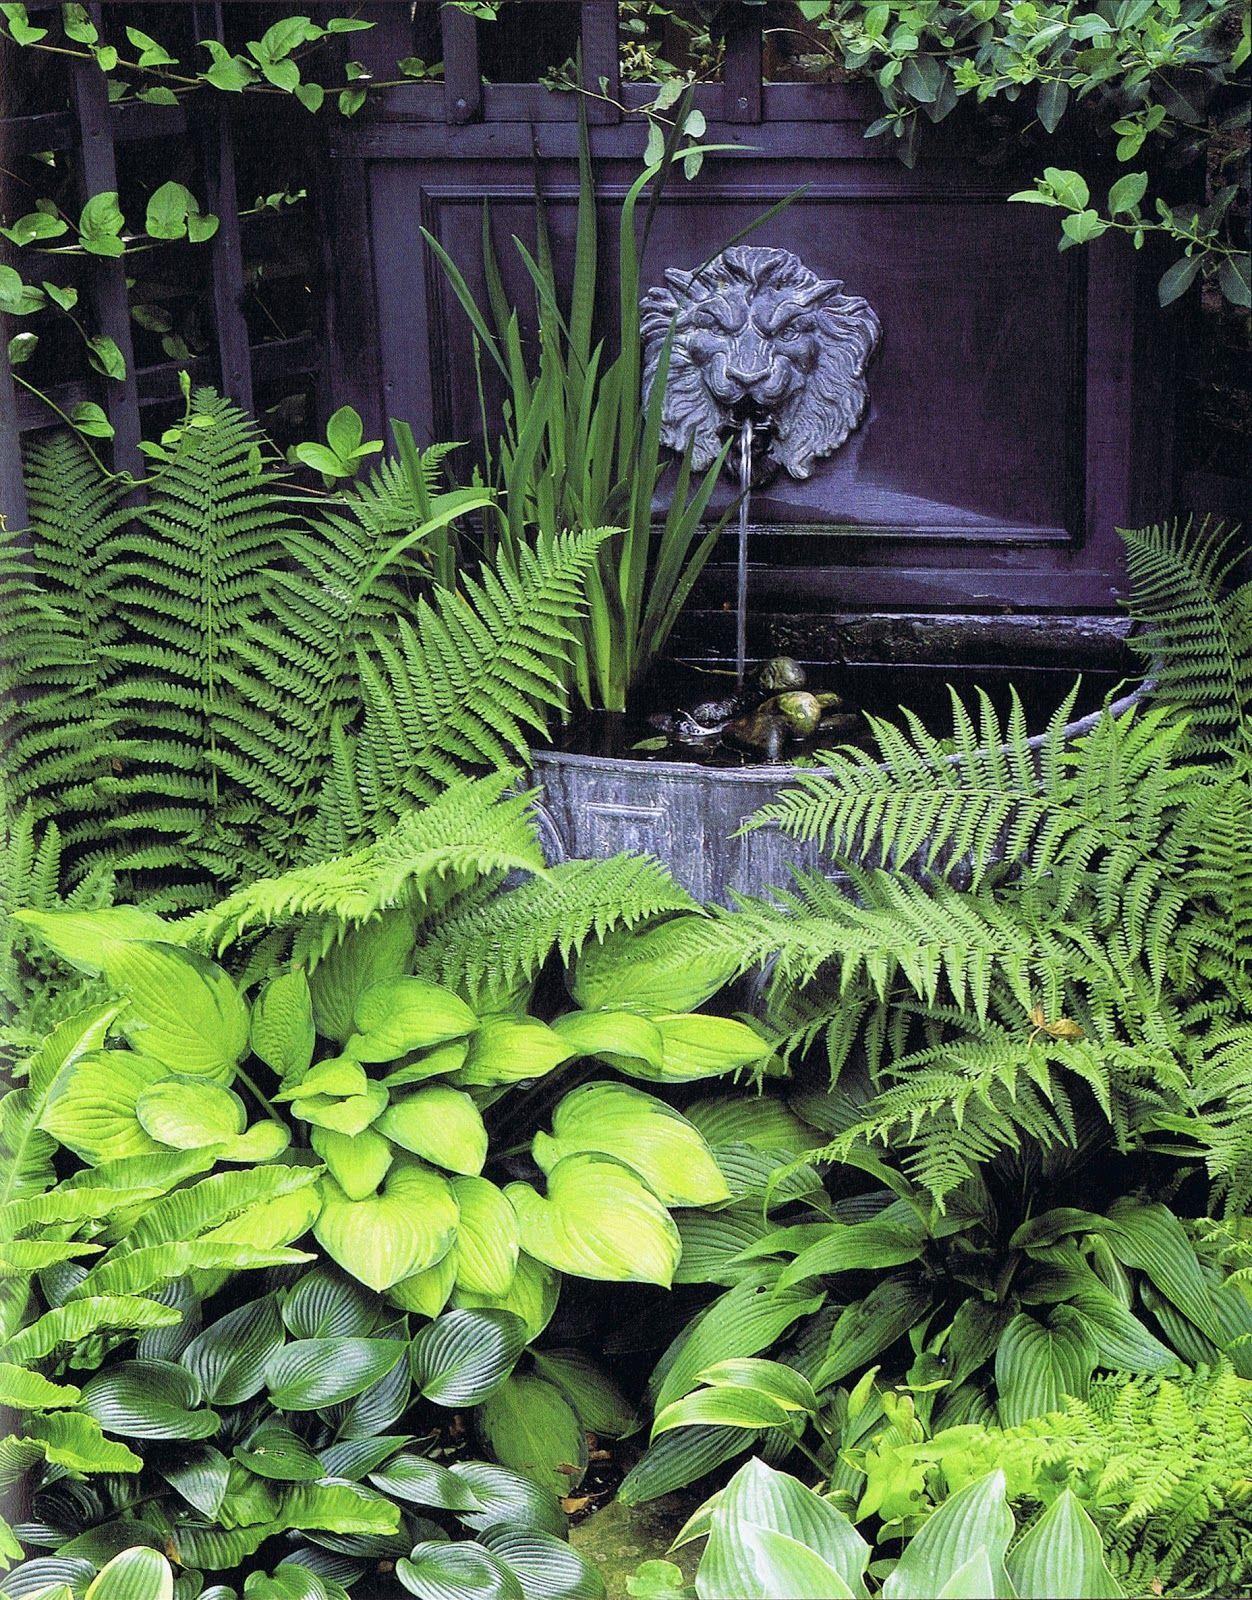 Kungsbacka Tr Dg Rdsdesign Tr Dg Rden Pinterest Fountain Plants And Gardens